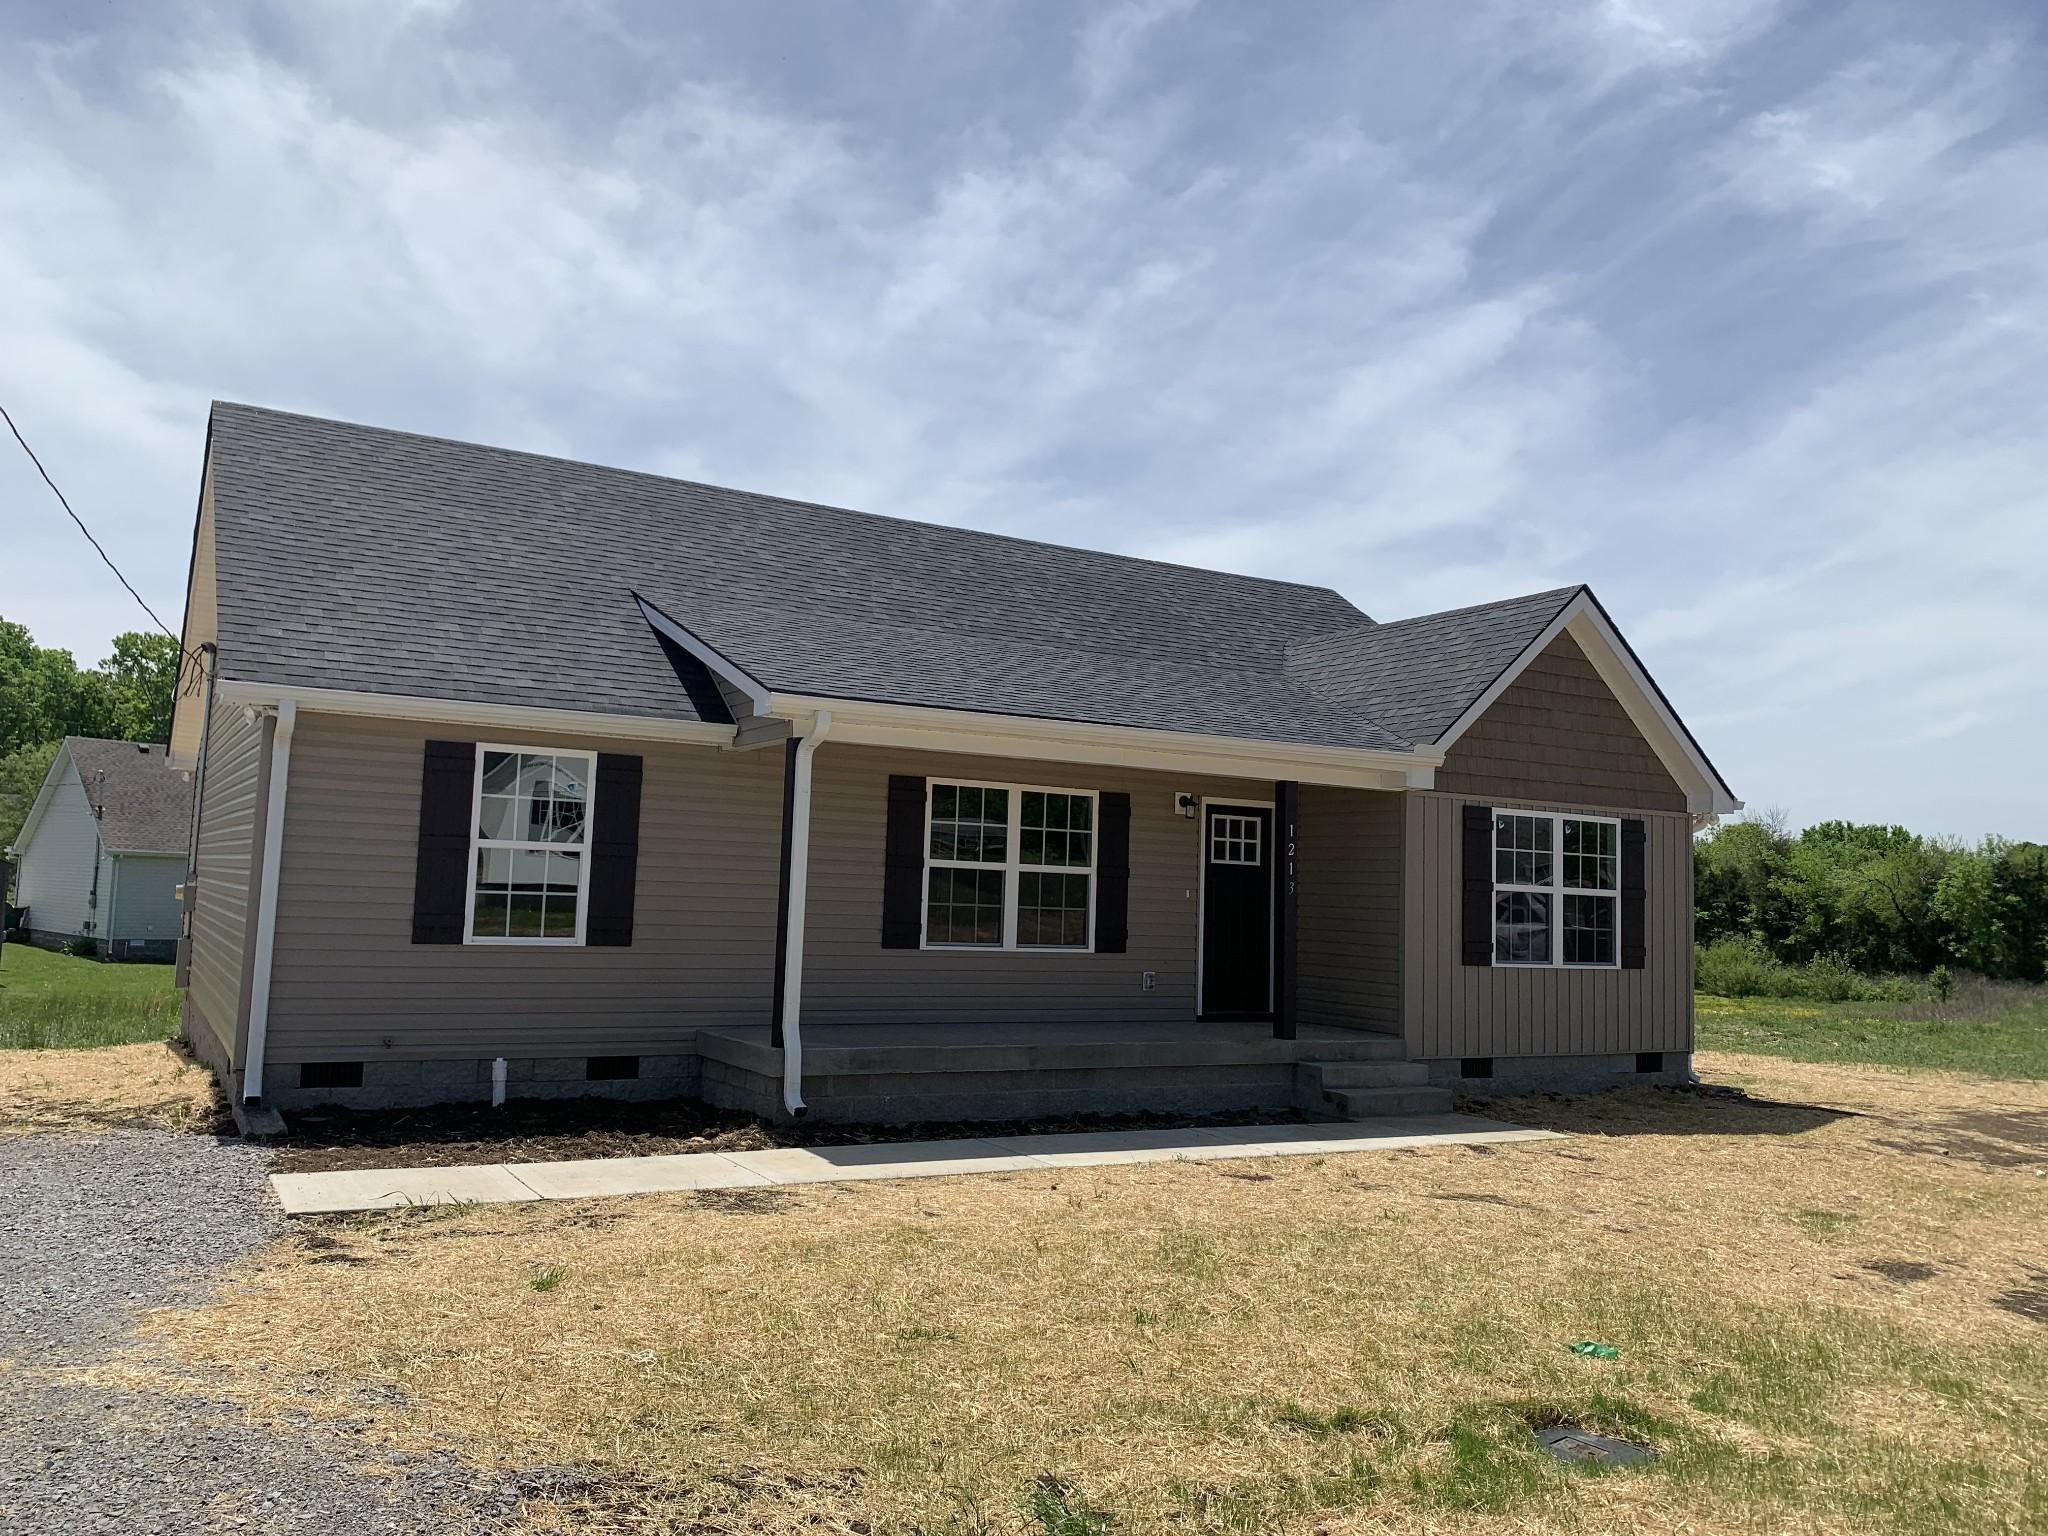 1213 Maelee Ann Dr Property Photo - Lewisburg, TN real estate listing